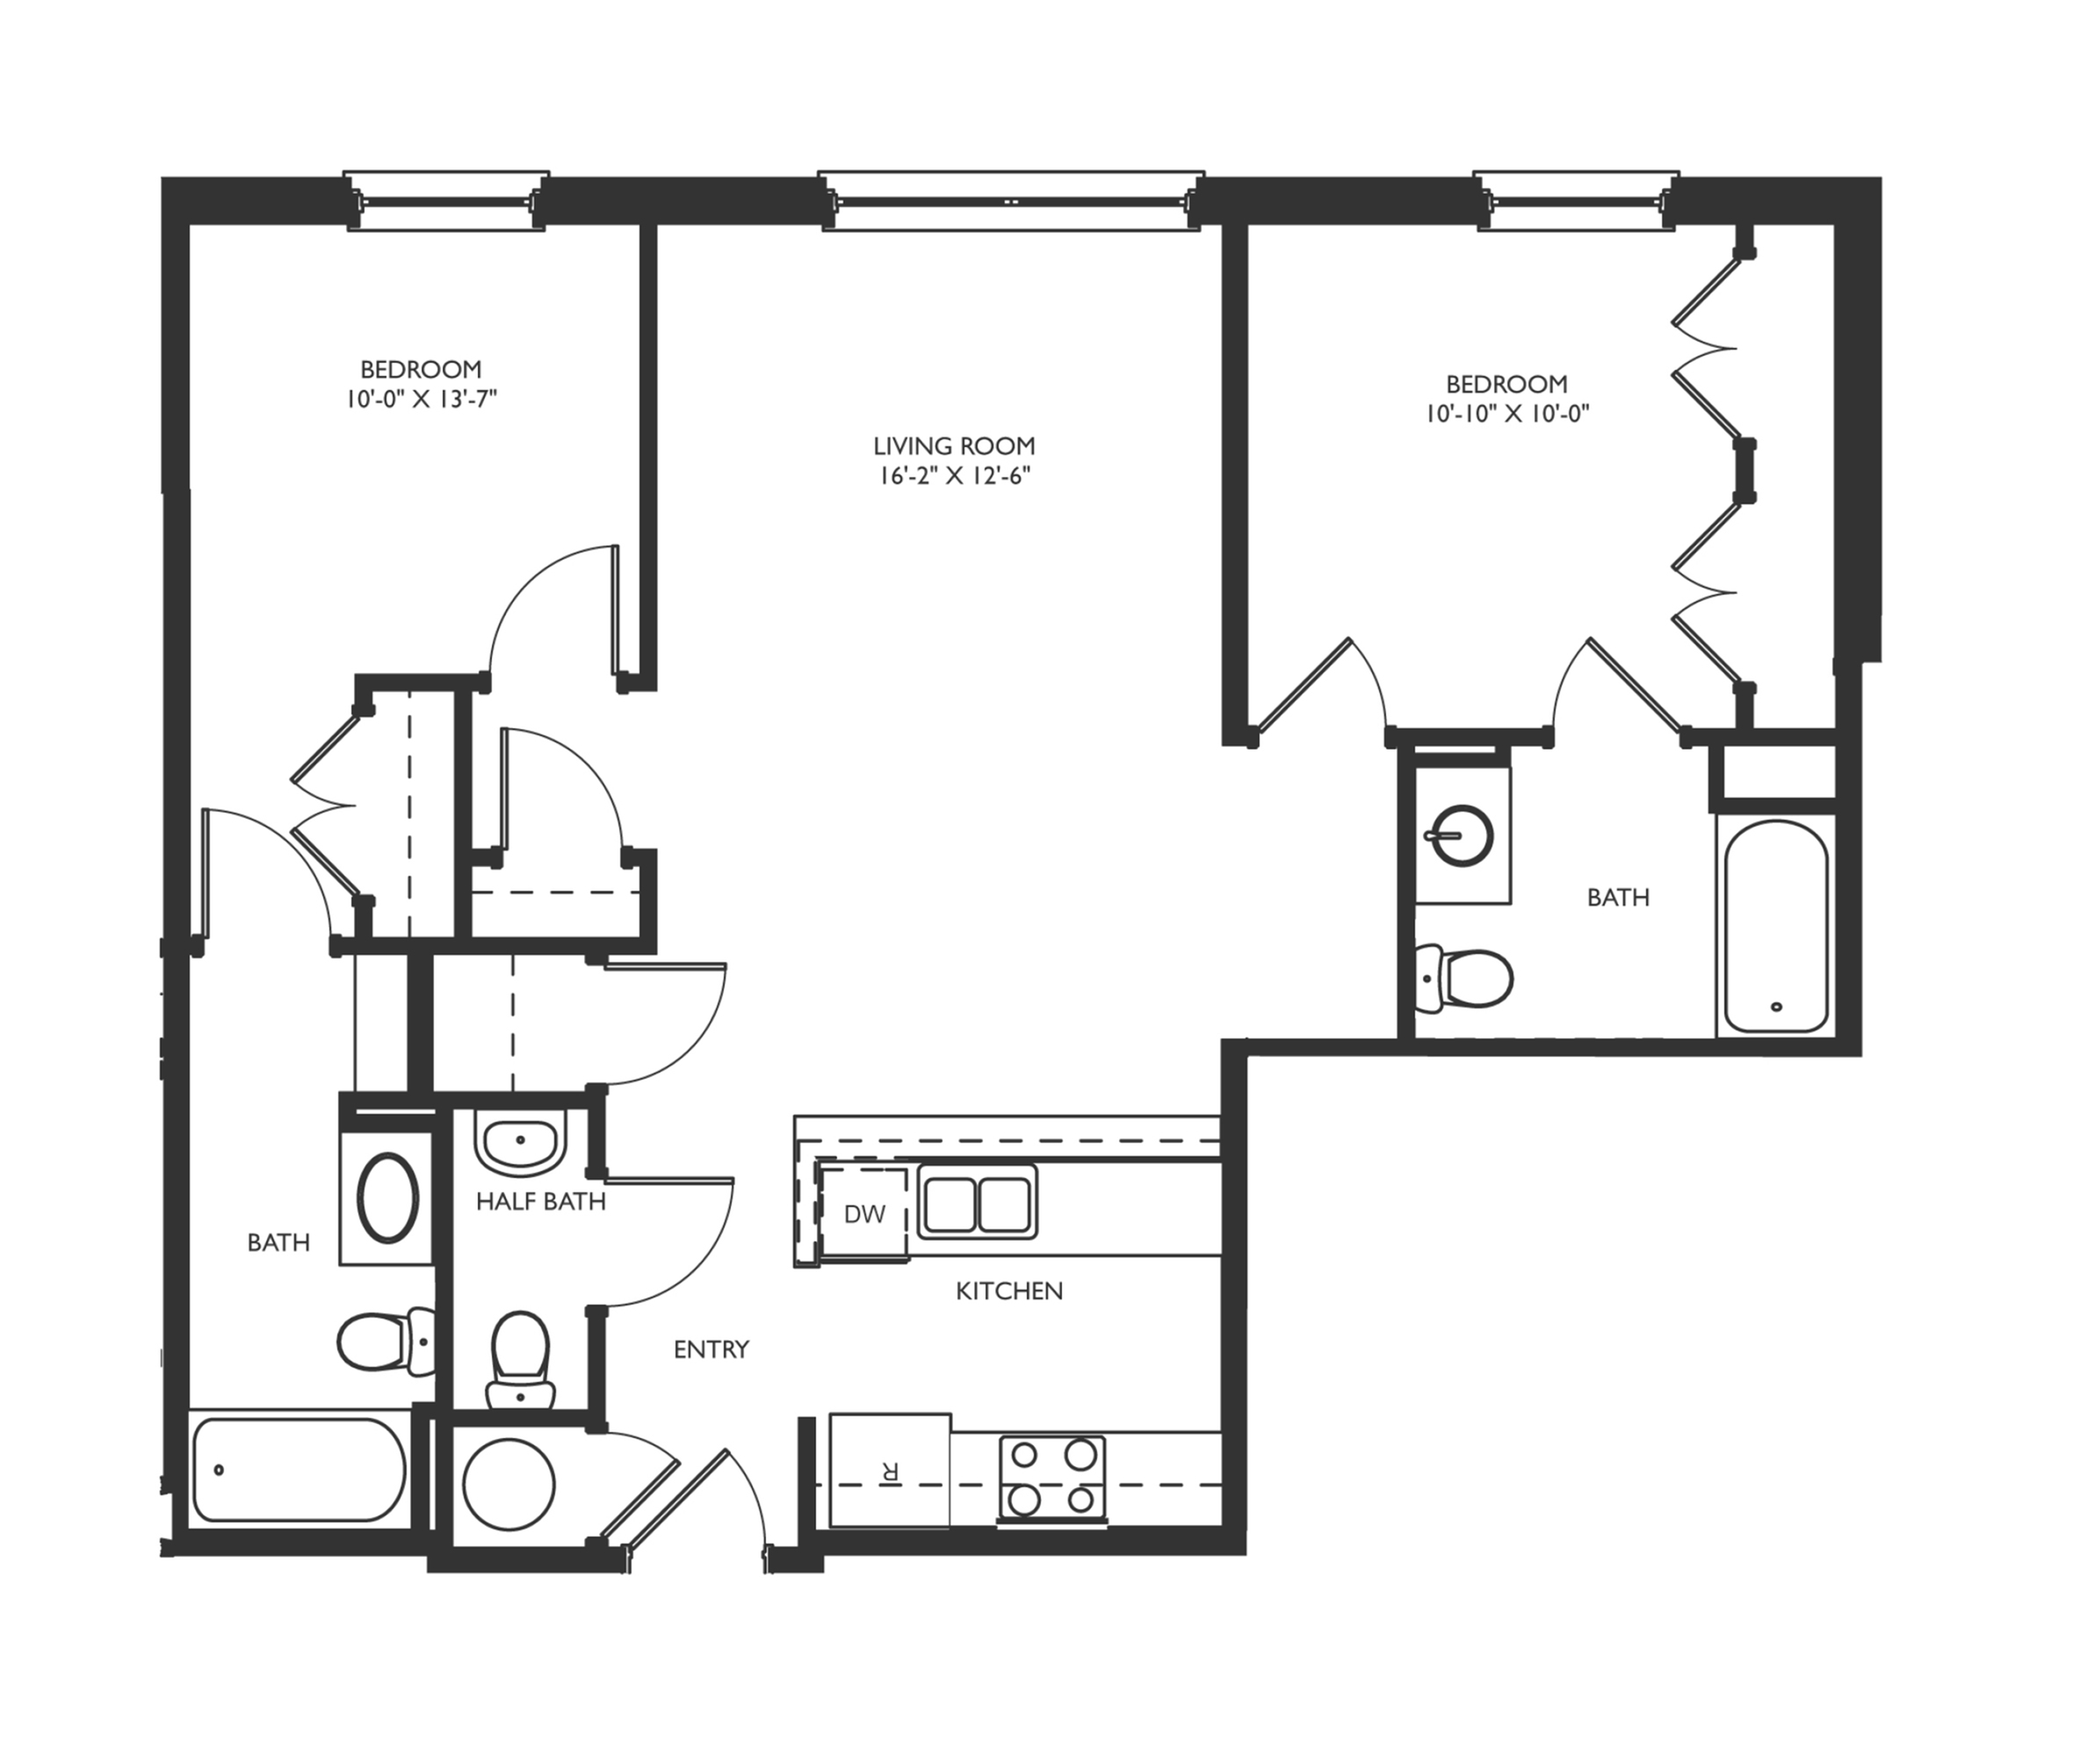 B3 Floor Plan Images